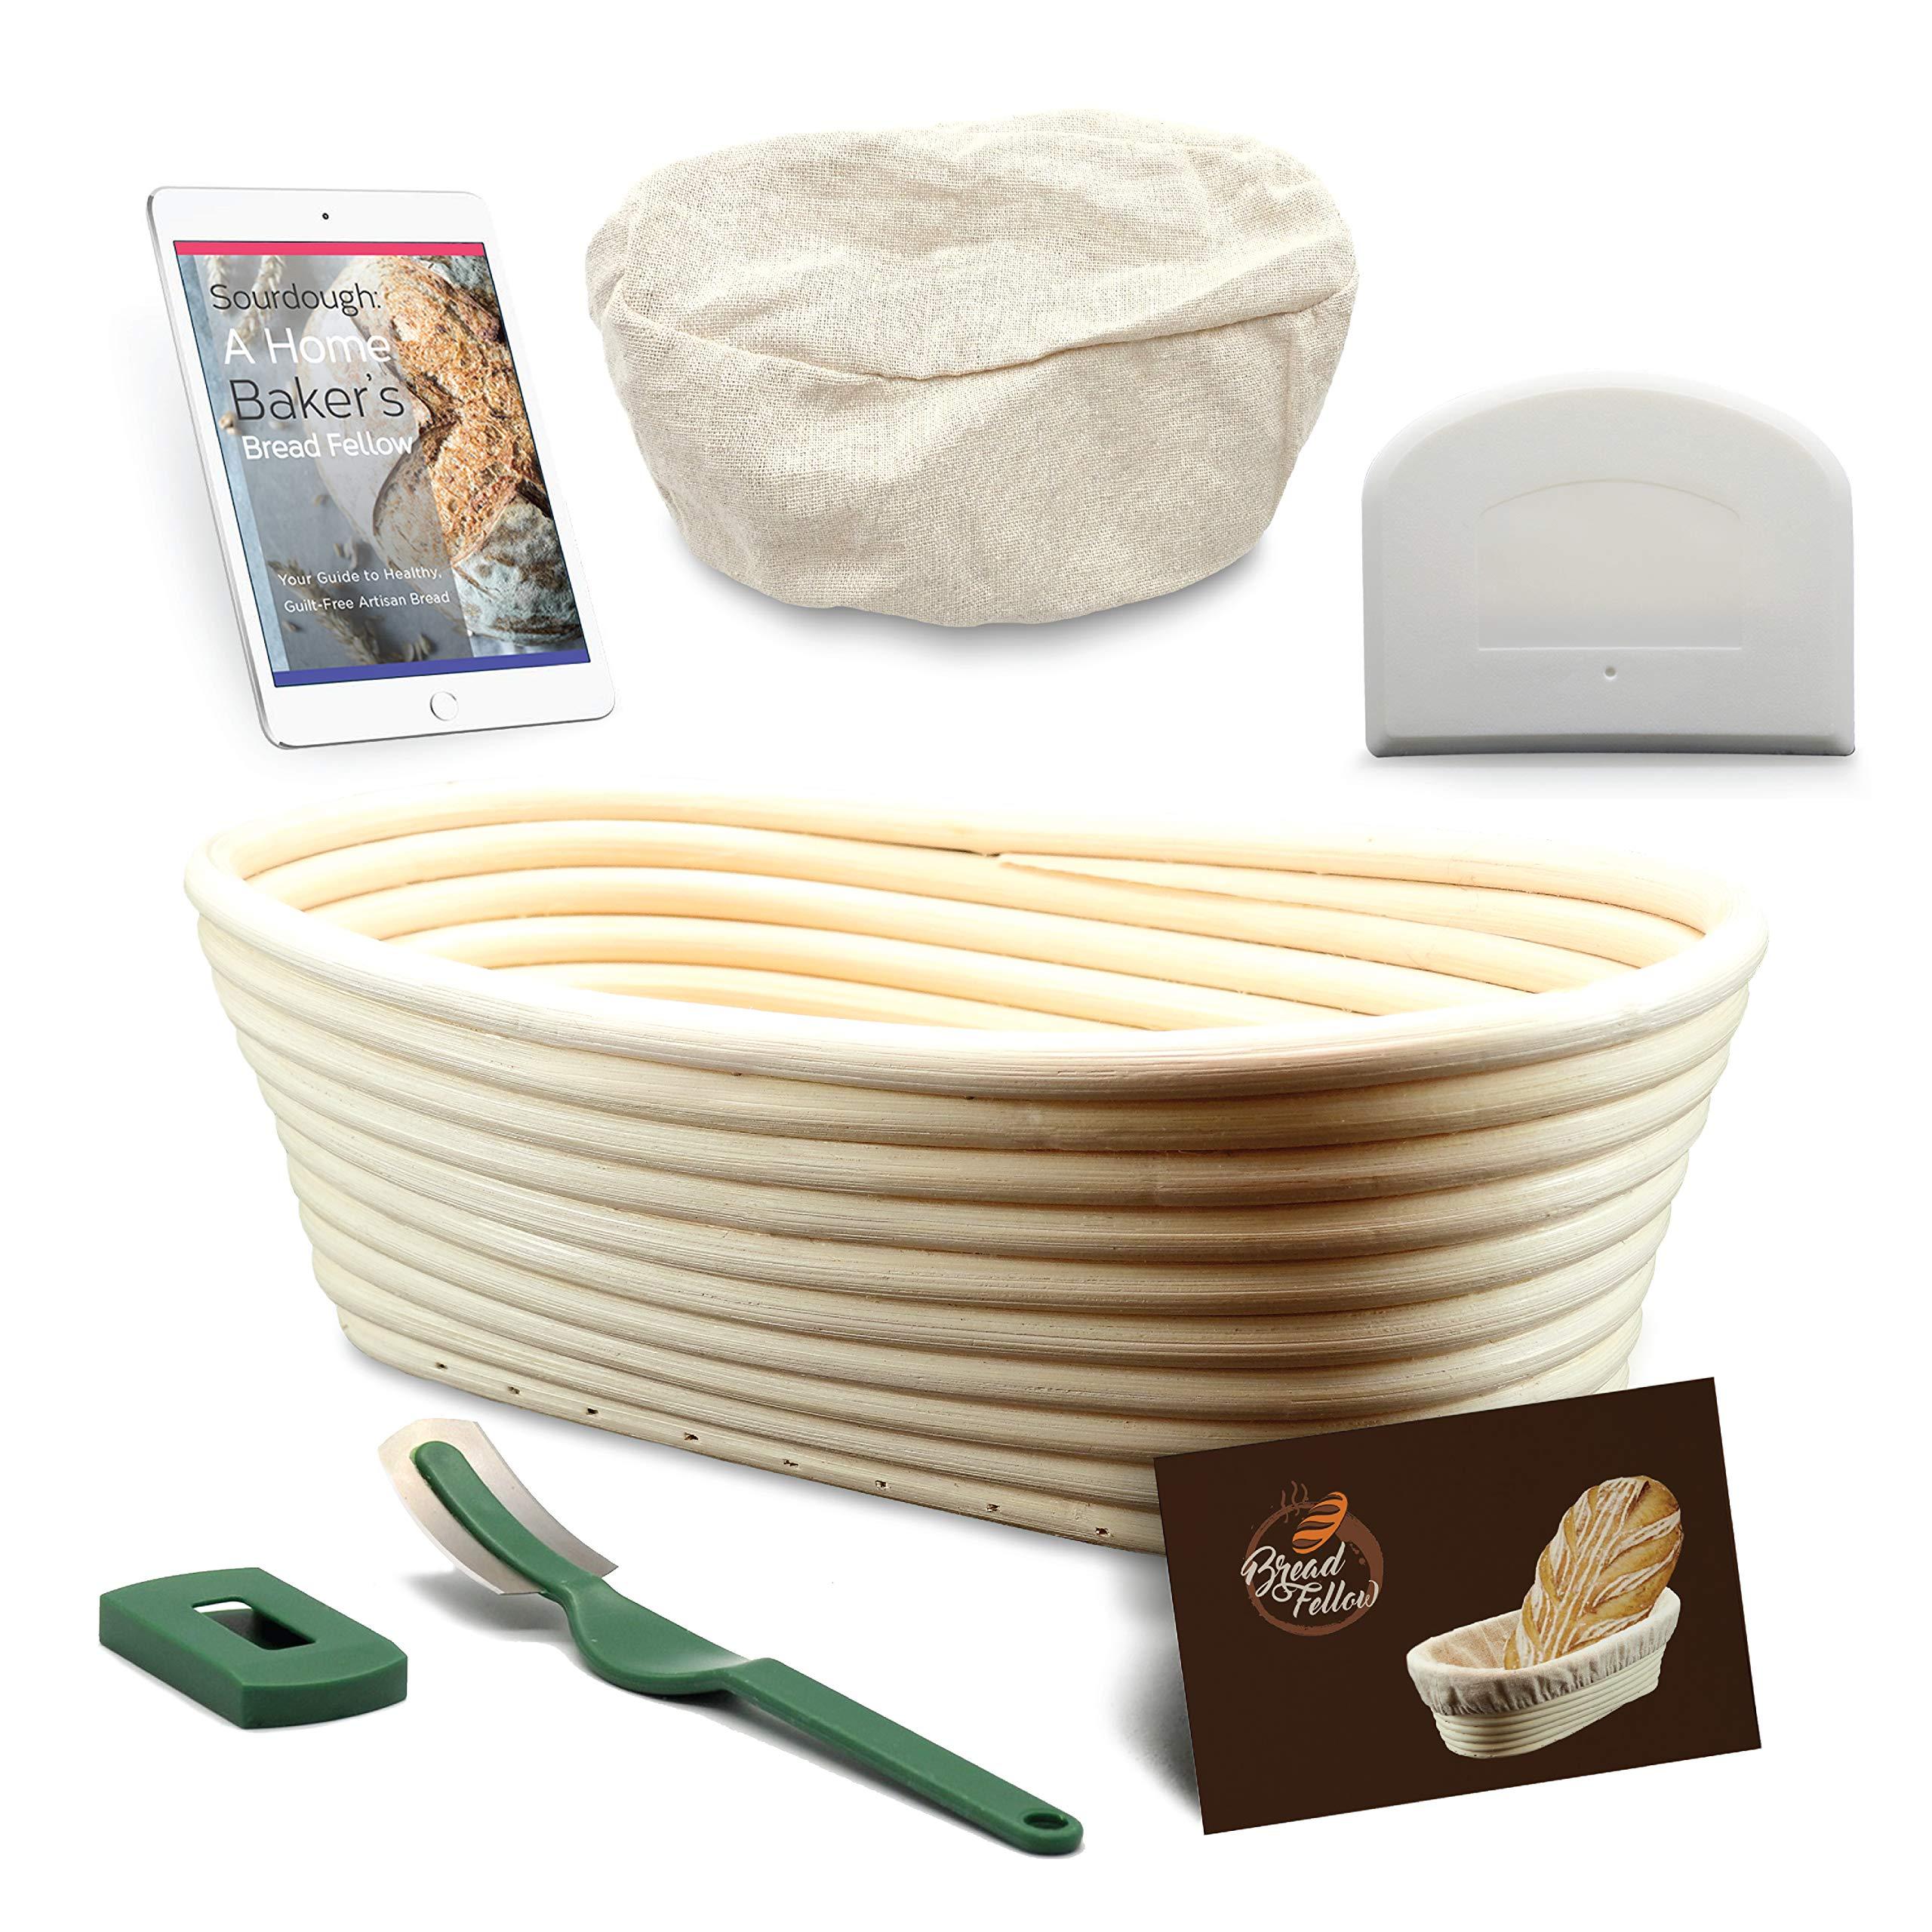 10 Inch Proofing Basket Oval Banneton Bread Basket - Bread Making Tools - Proofing Baskets for Sourdough Bread | Bread Scraper Dough | Bread Lame | Cloth Liner - Bread Baking Set by Bread Fellow